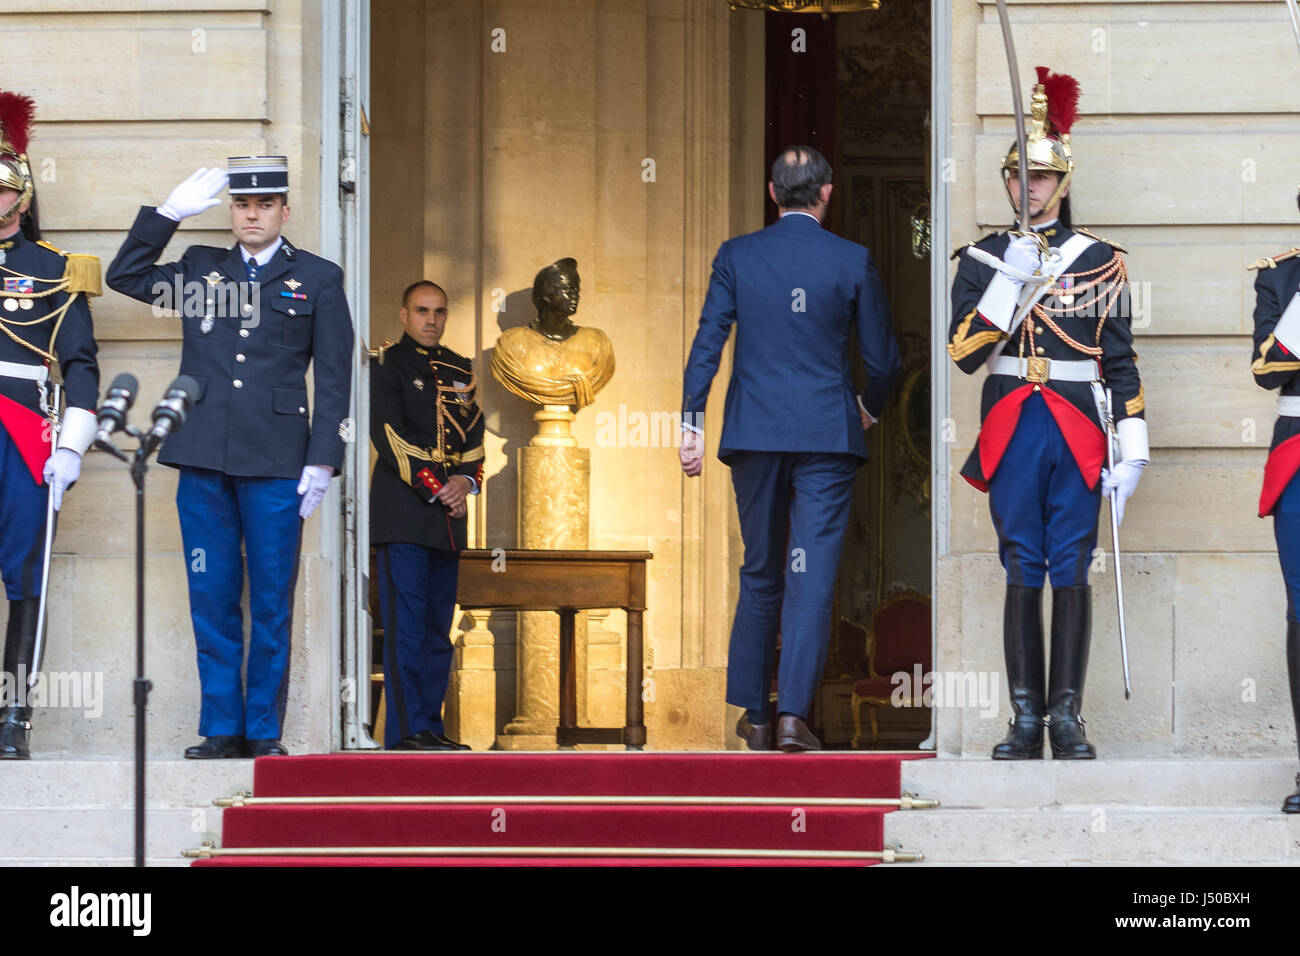 Paris, France. 15th May, 2017.  Prime Minister handover in Matignon  -  15/05/2017  -  France / Paris  -  Ceremony - Stock Image